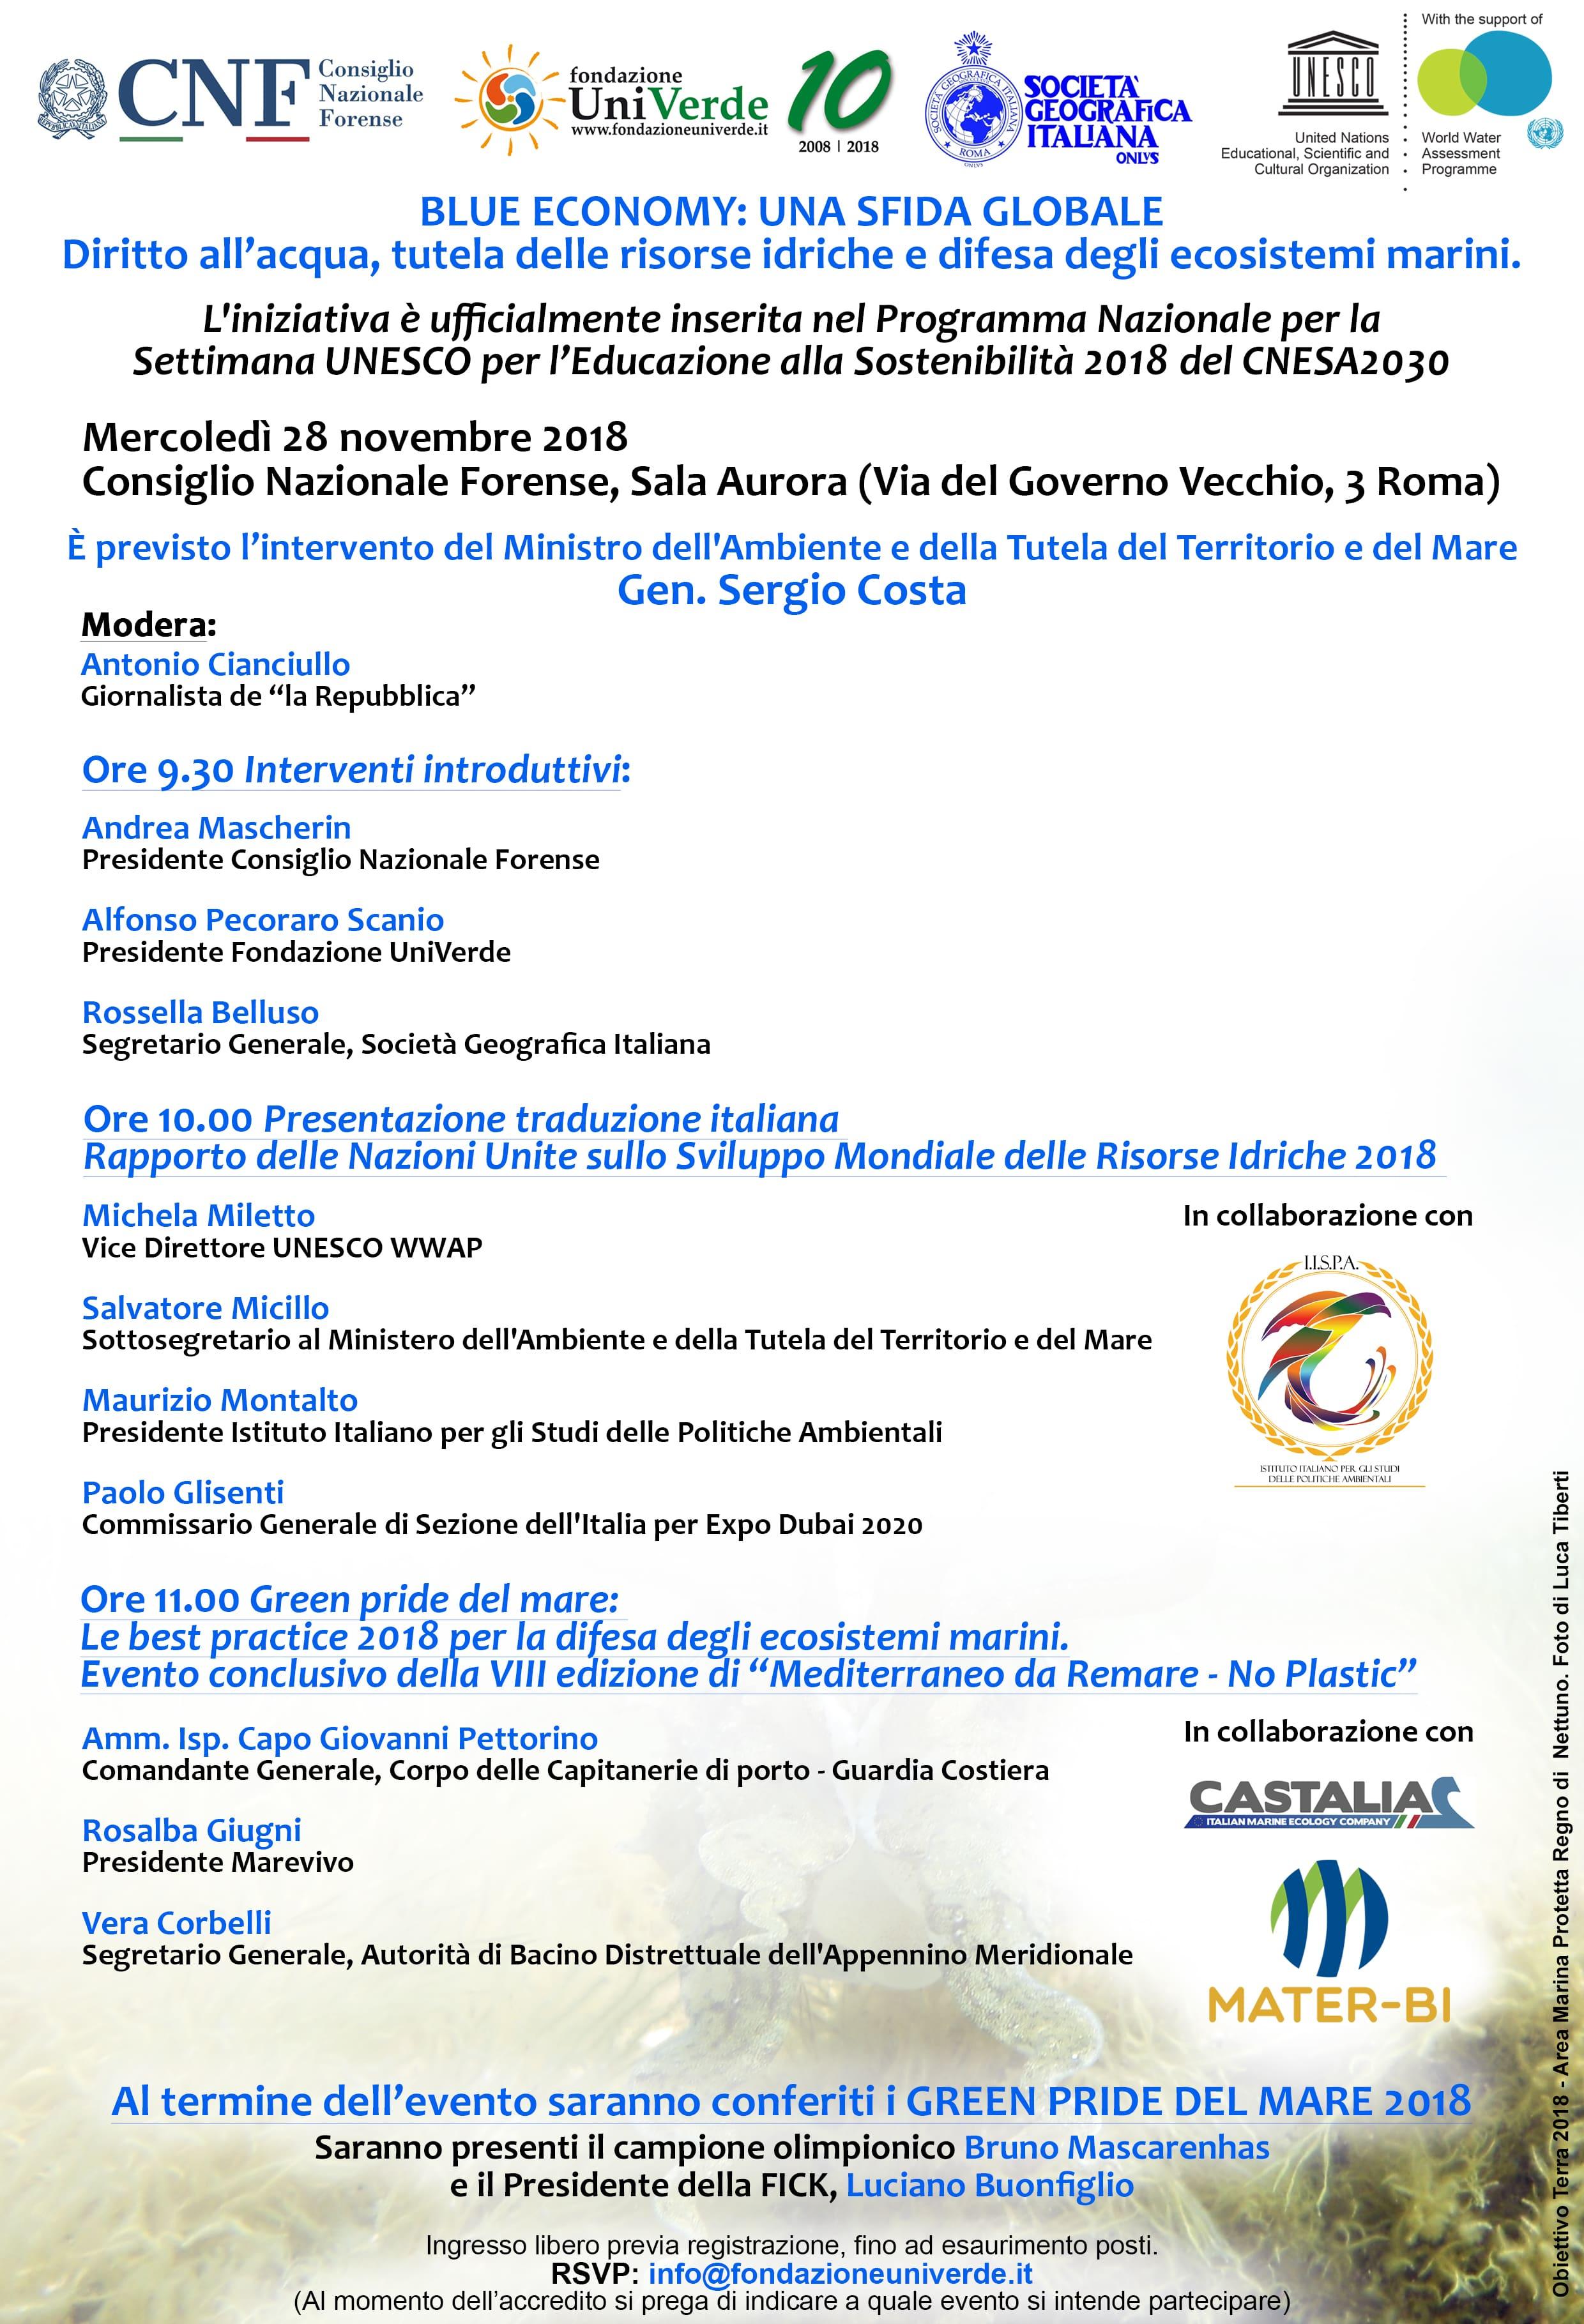 Roma, 28 novembre 2018 - CNF, Sala Aurora